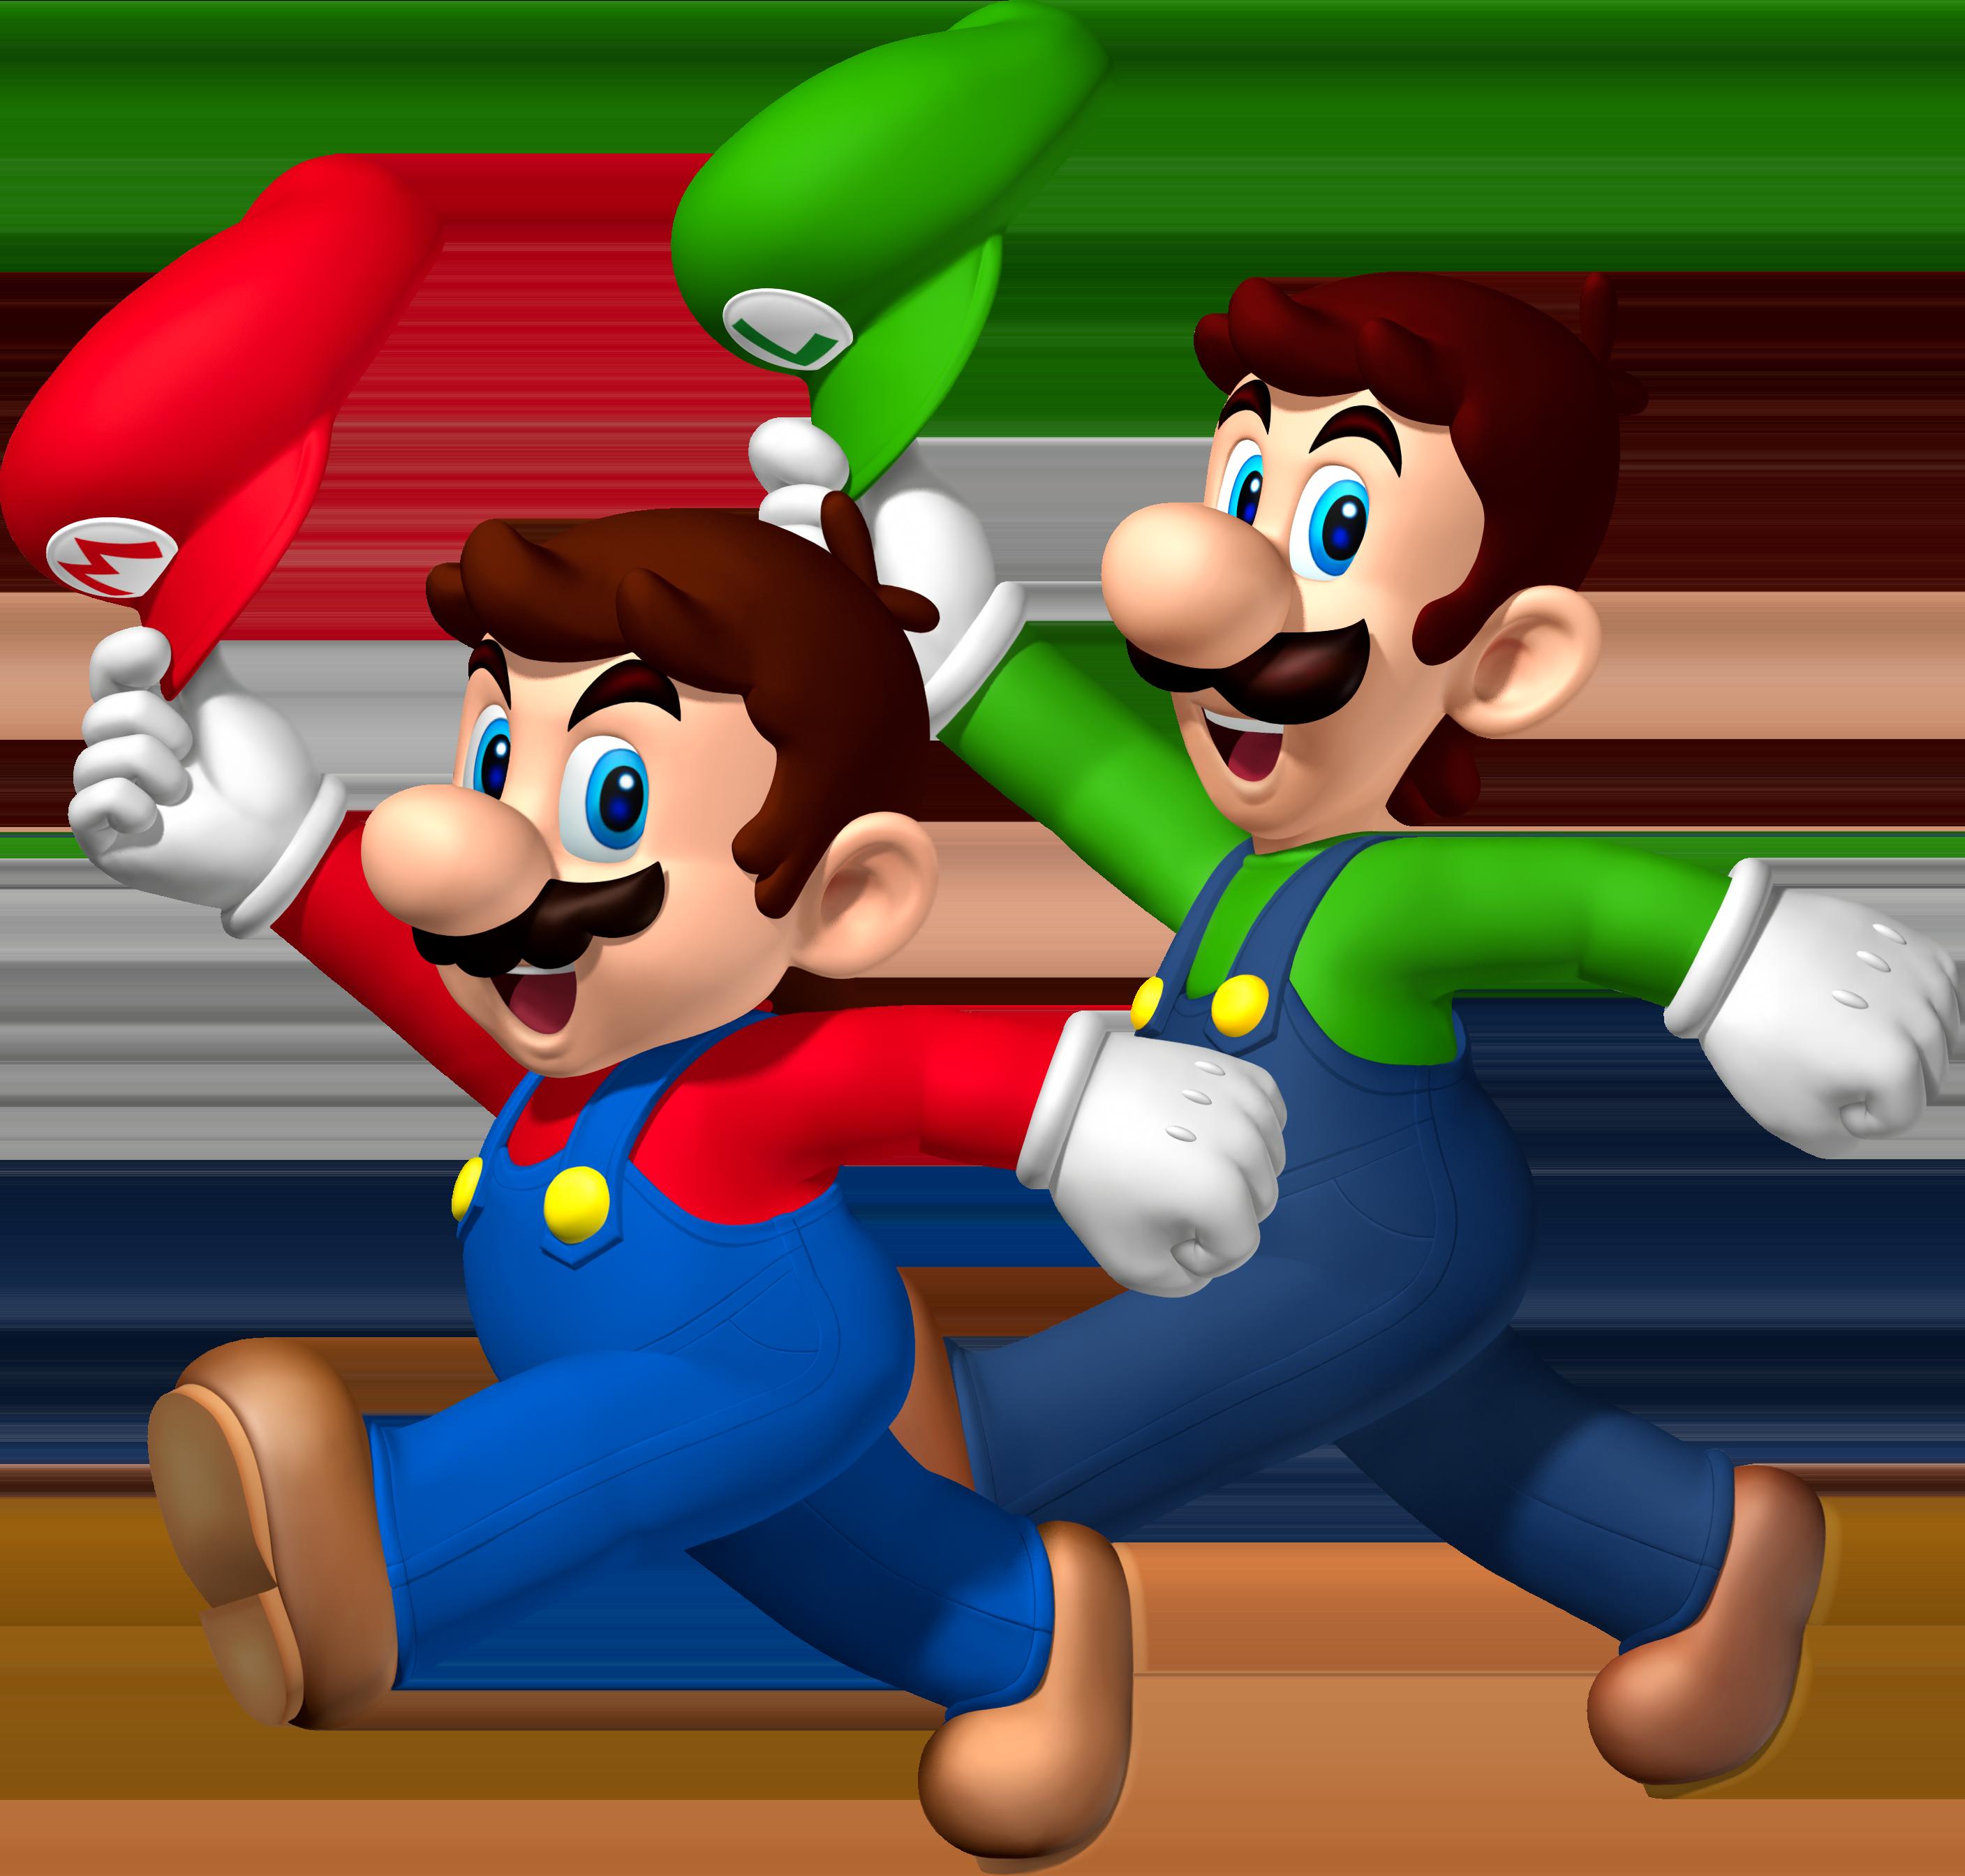 Mario Running PNG Image   Mario and luigi, Mario bros ...